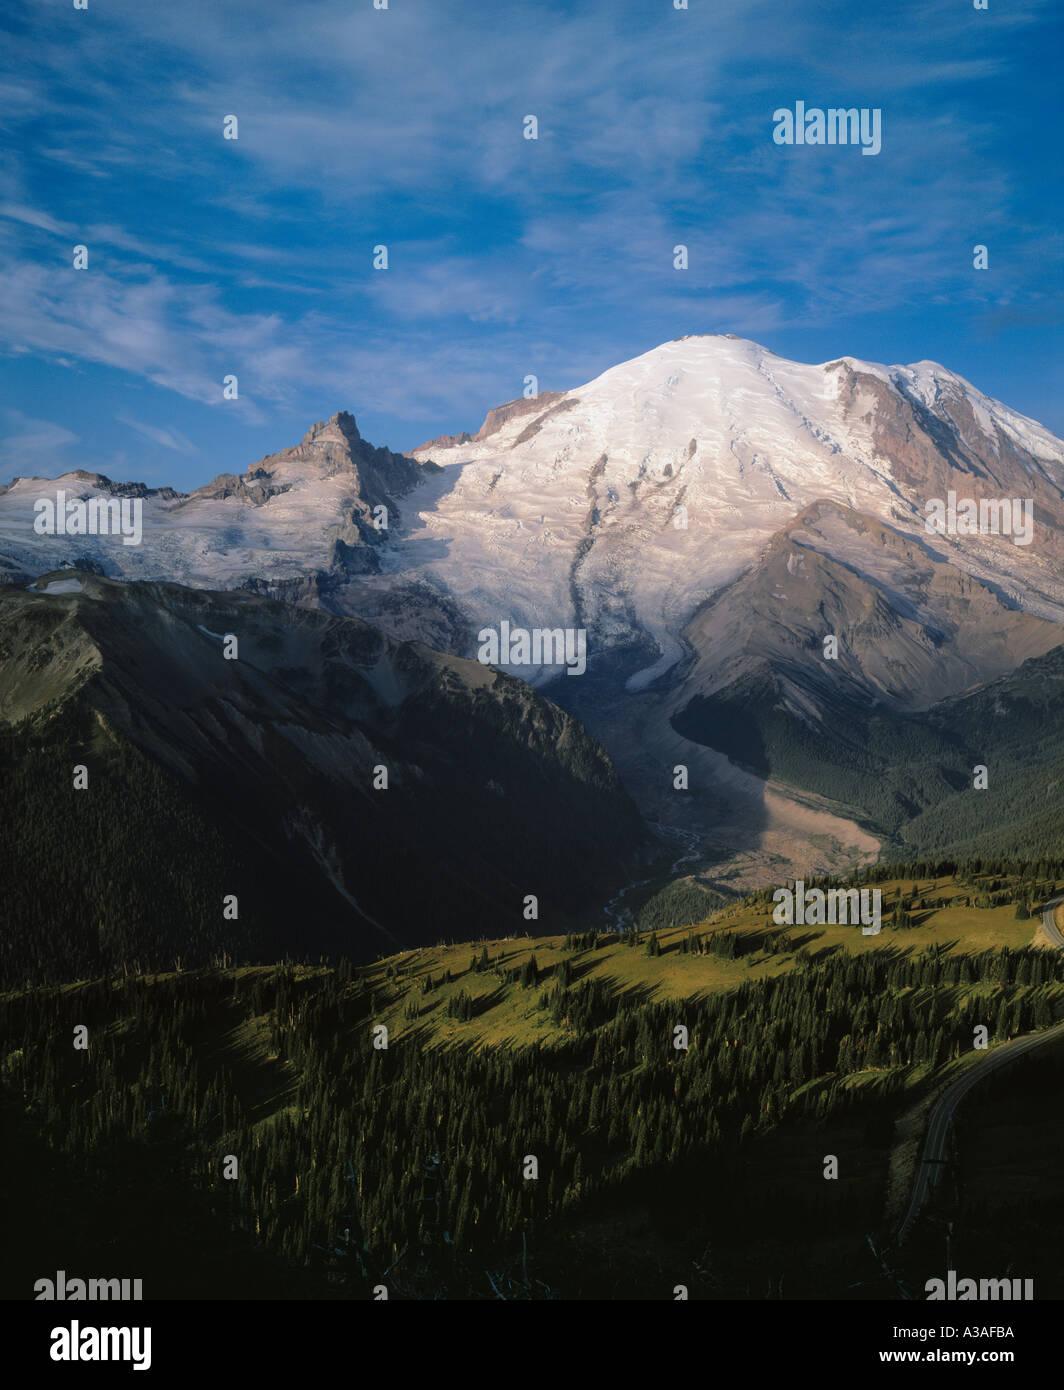 Mt Rainier National Park, WA, USA, Sunrise Area, First Light on the Summit, 14410 ft, NE Face, Emmons Glacier, Valley, Meadow - Stock Image